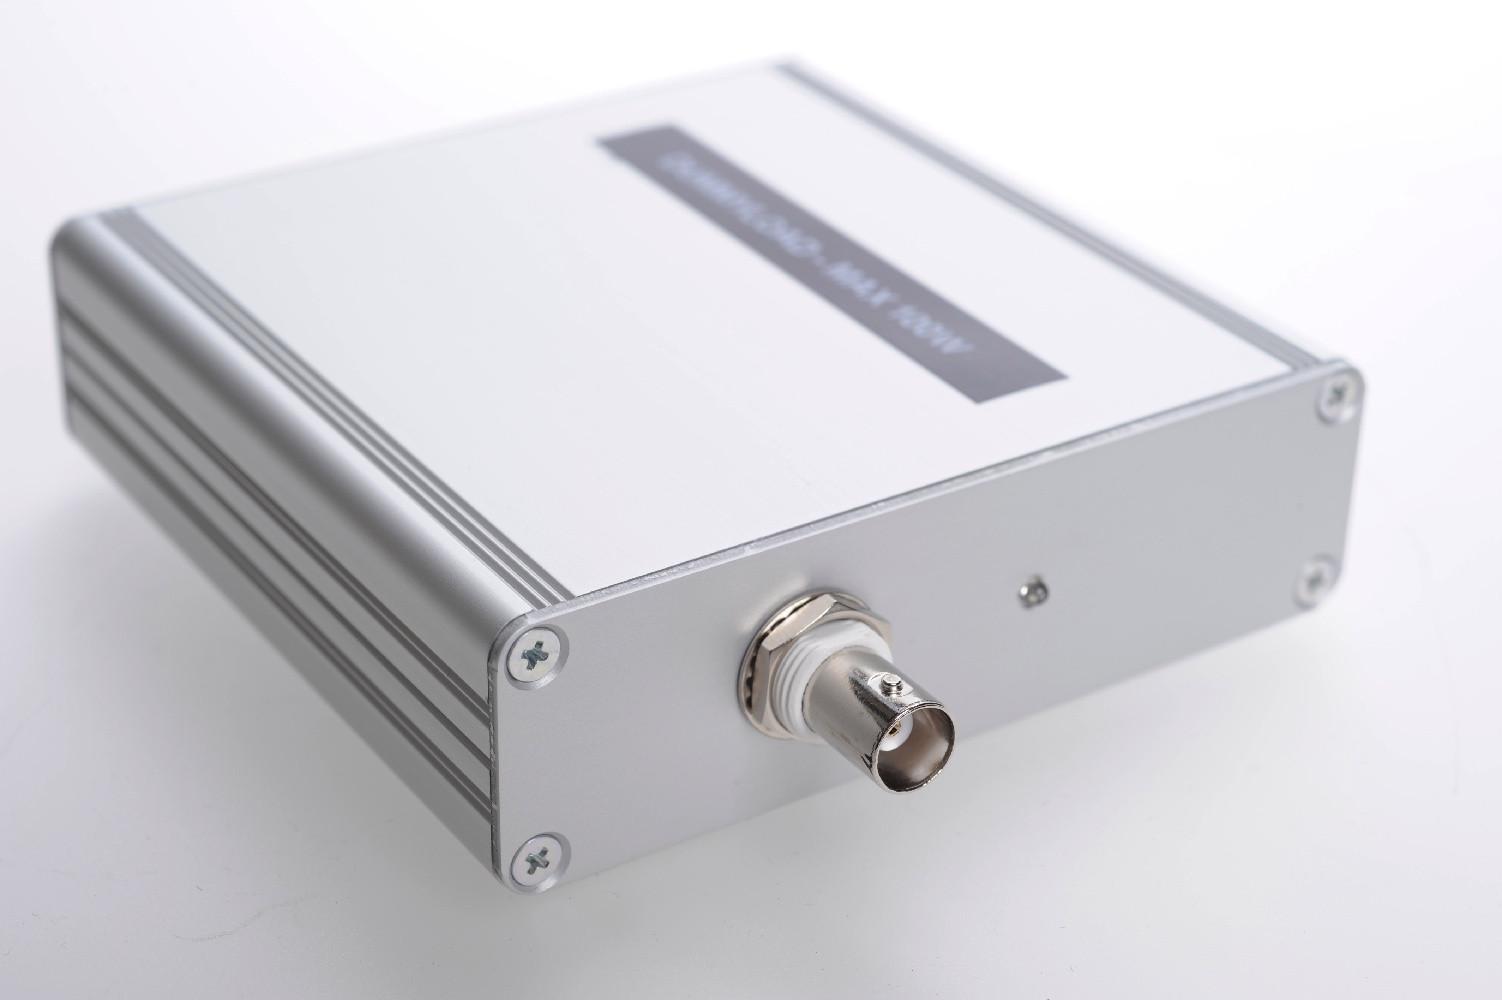 DummyLoad 100 Watt - case